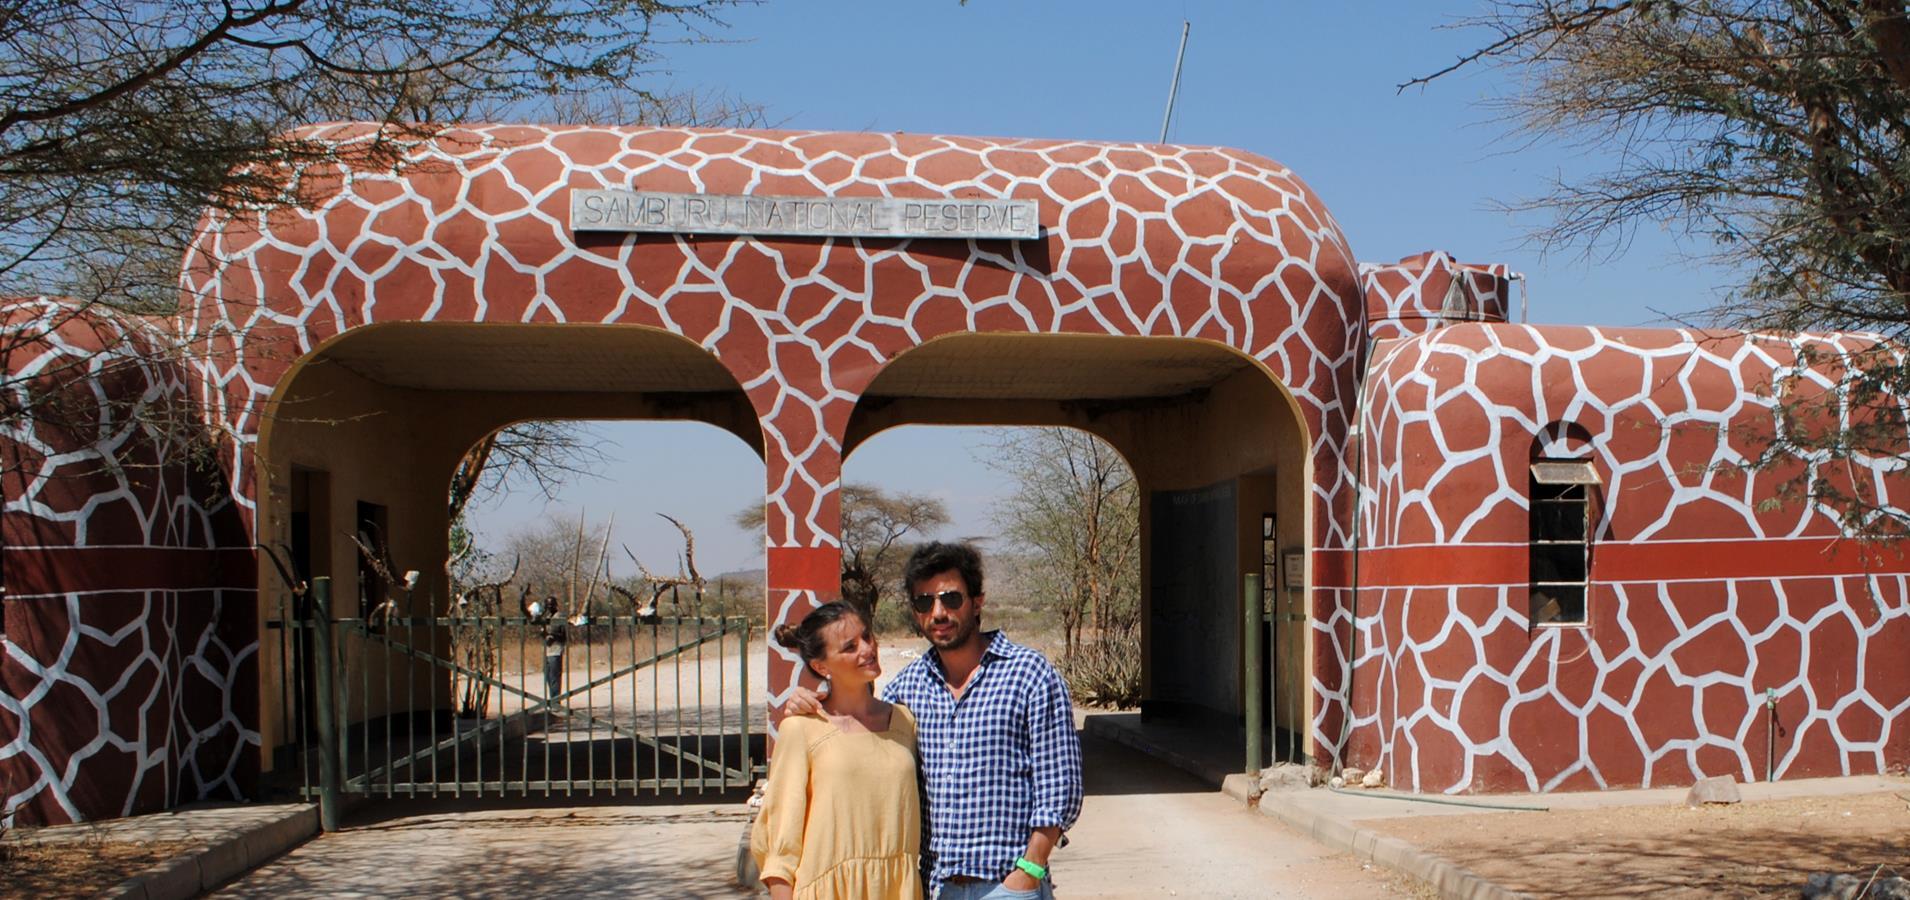 reserva-natural-samburu-entrada